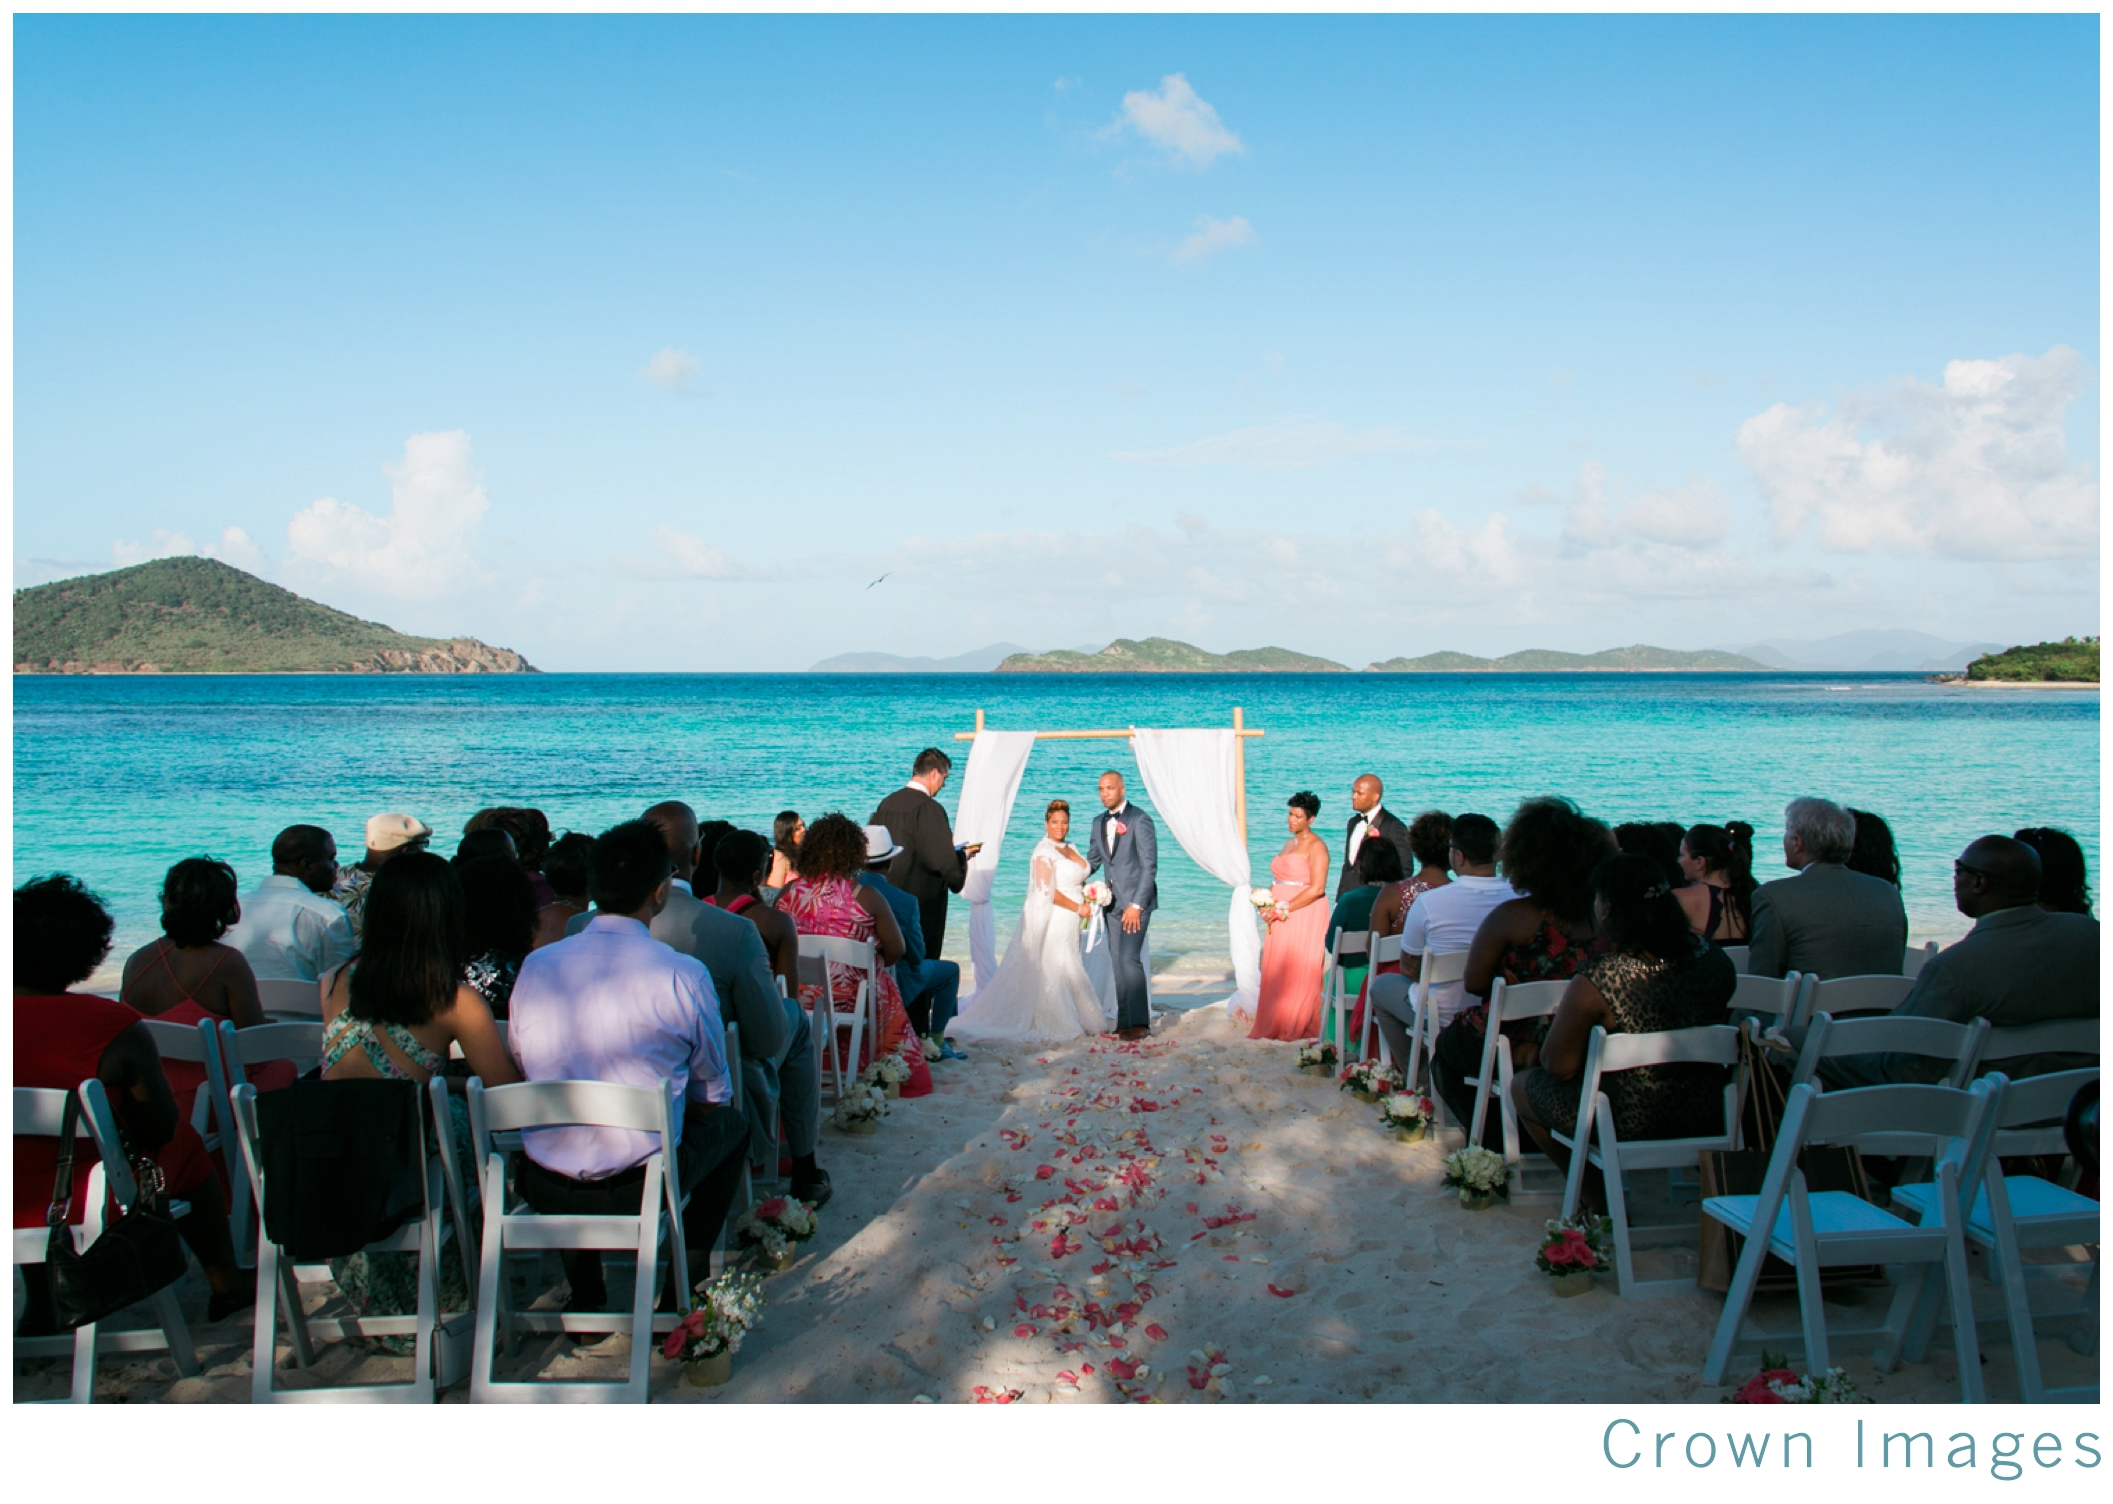 st-thomas-wedding-photographer_1079.jpg